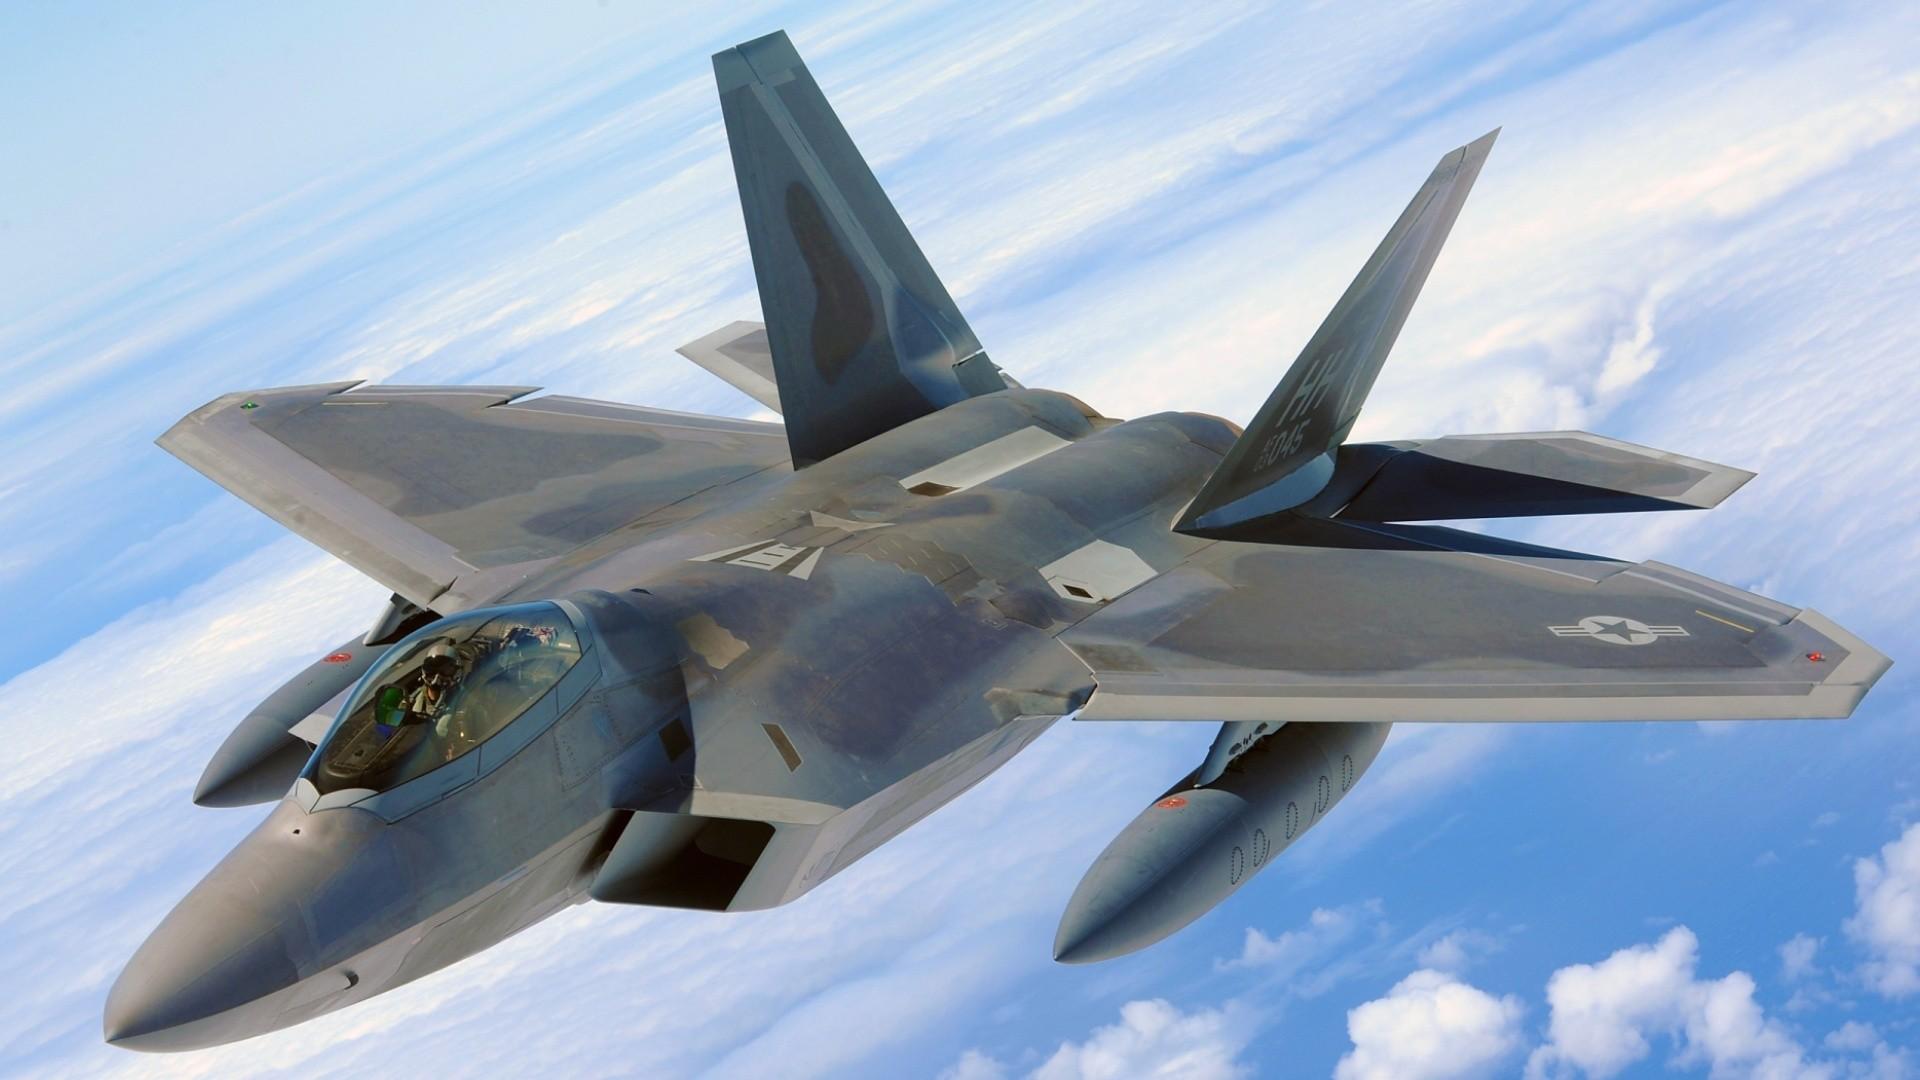 22 Raptor aircraft blue close up f 22 raptor sky 1920x1080